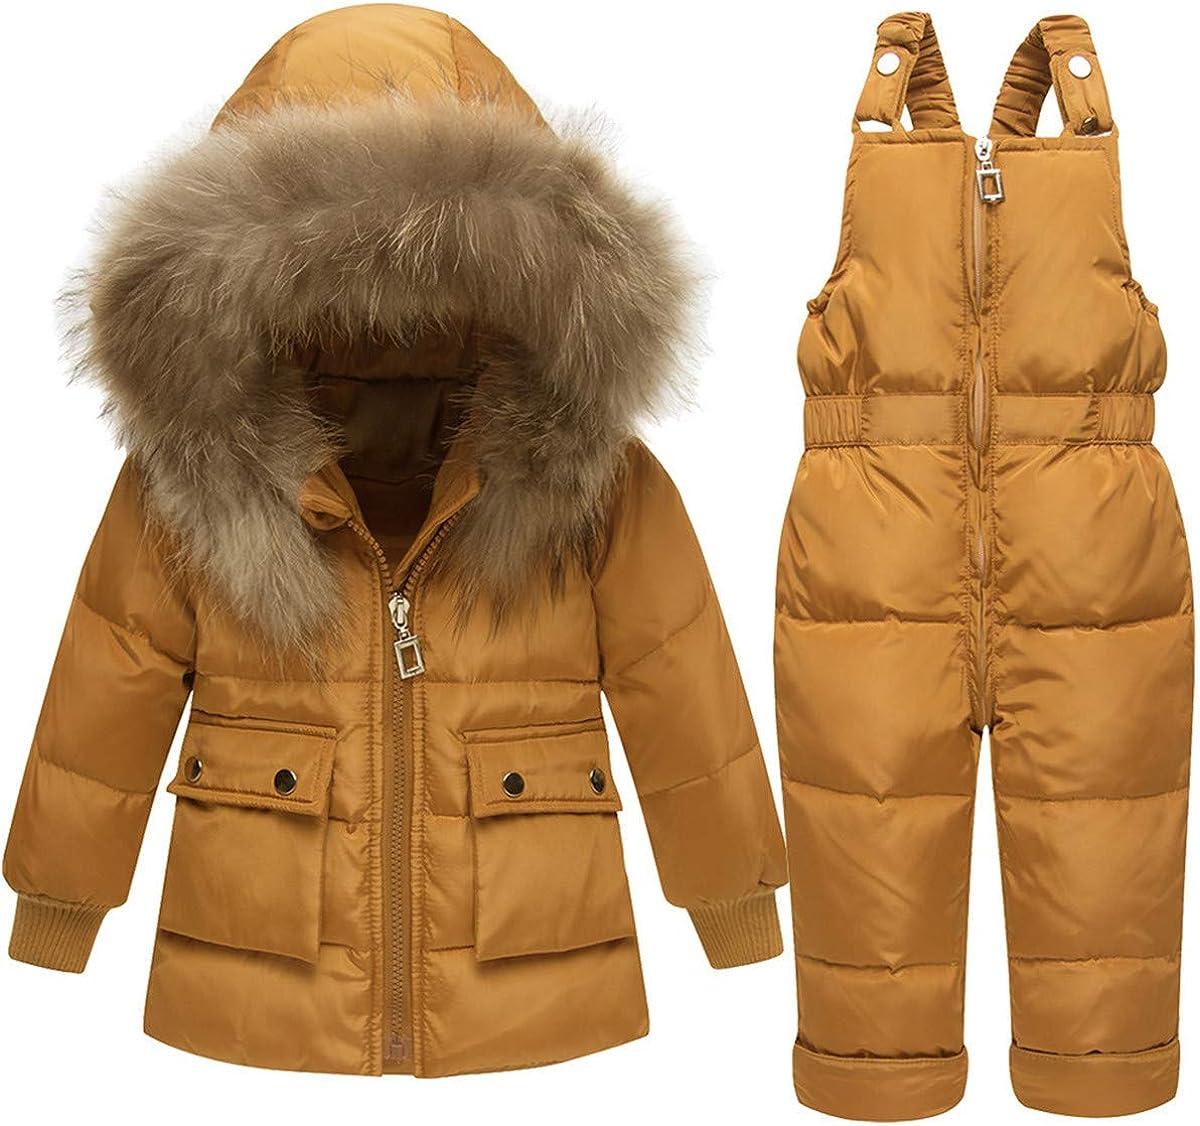 REWANGOING Baby Kids New Shipping Free Girls Winter Warm Pock Zipper Trim Fur 2Pcs Minneapolis Mall